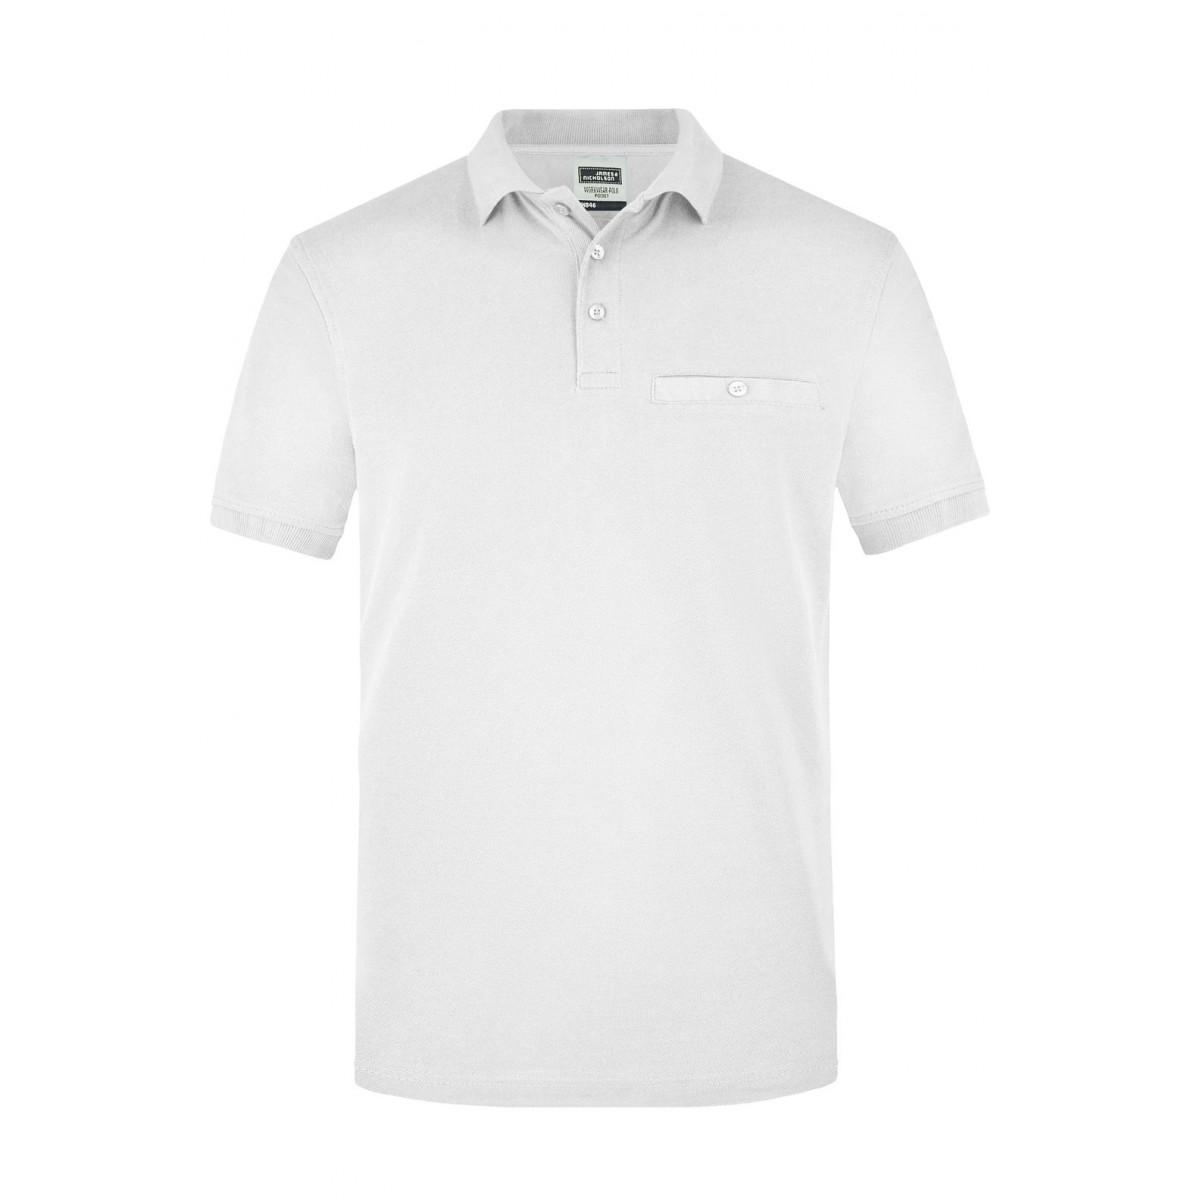 Рубашка поло мужская JN846 Men´s Workwear Polo Pocket - Белый